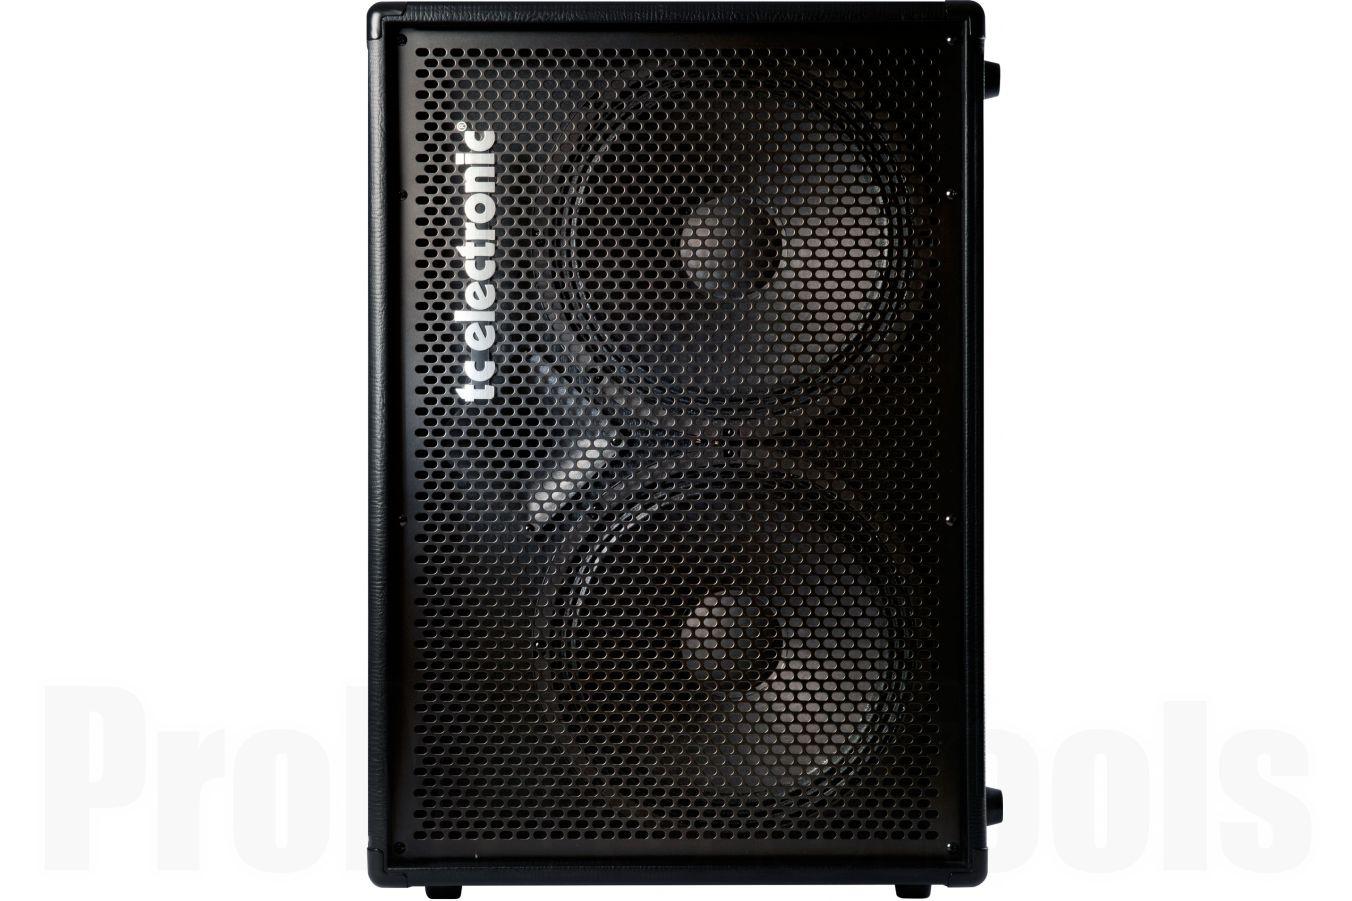 TC Electronic BC210 - b-stock (1x opened box)